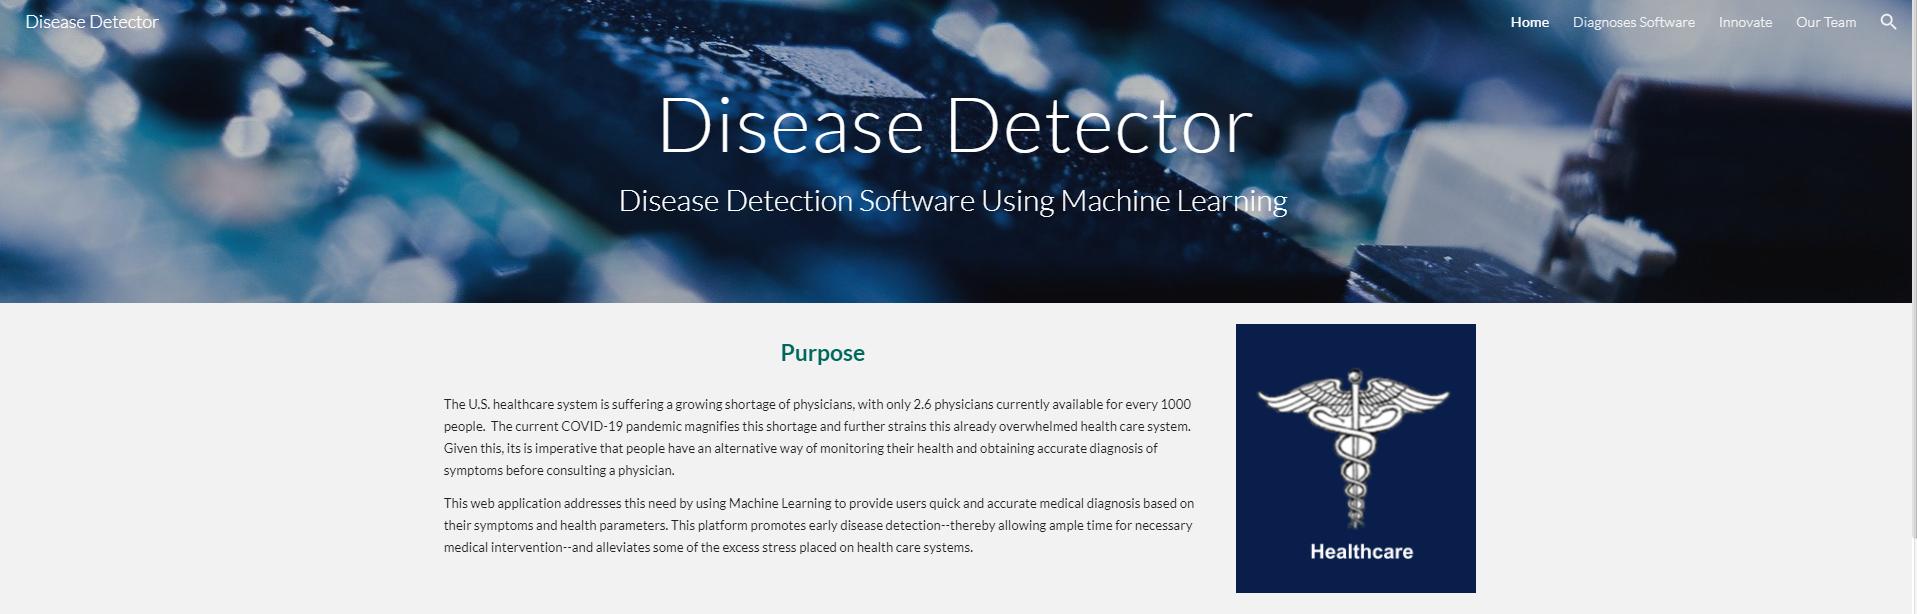 Disease detector diagram pi7arcd4kc